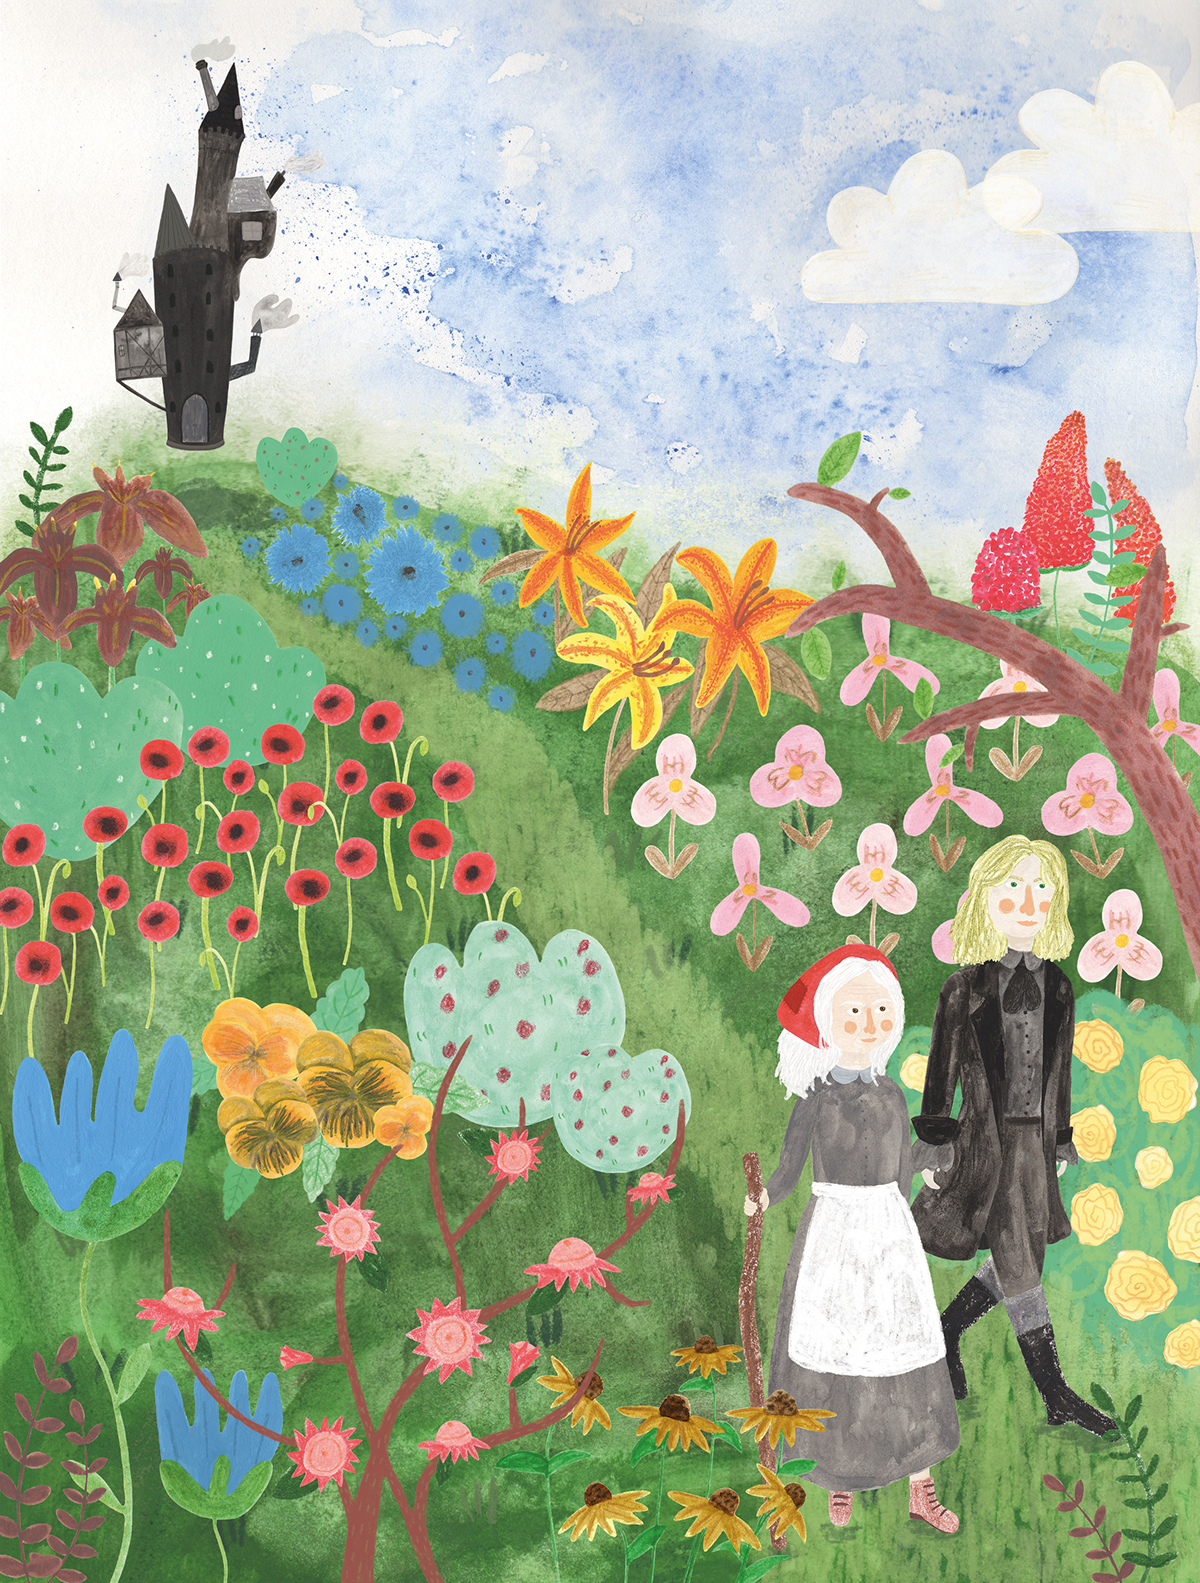 ILLUSTRATION  mixed media Magical Flowers Landscape Castle girl howl Hats marshes